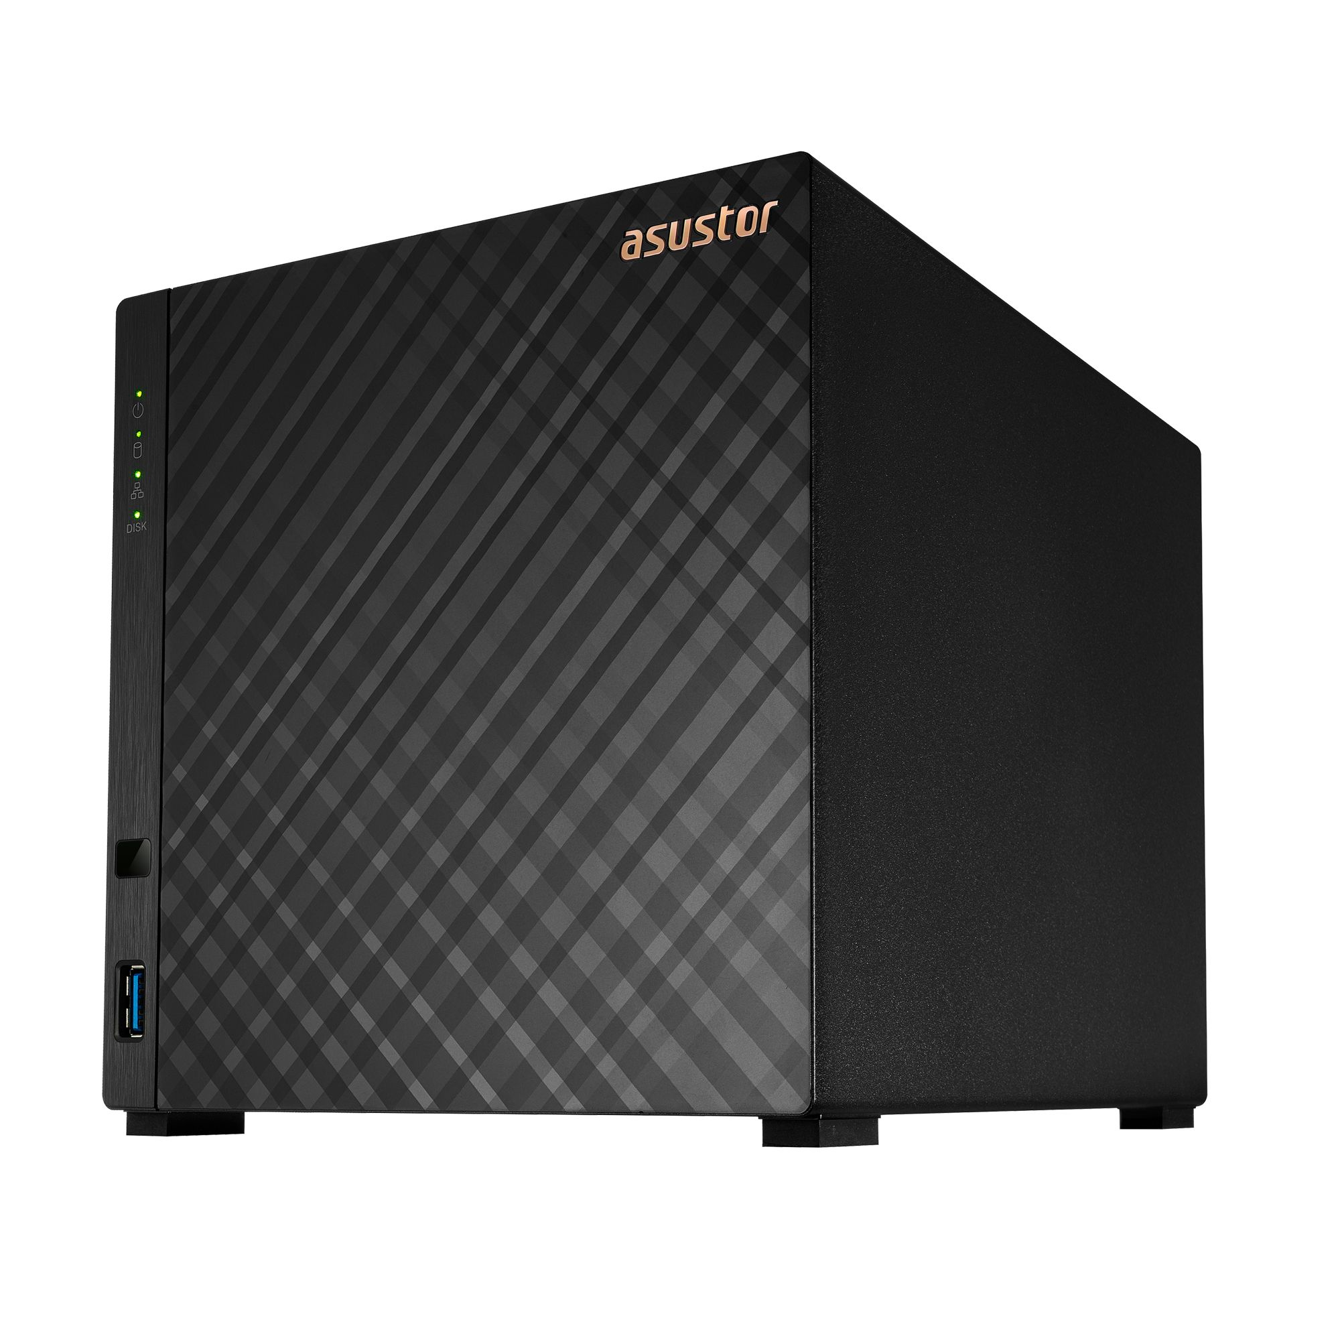 ASUSTOR Drivestor Pro: NAS dedicated to home use